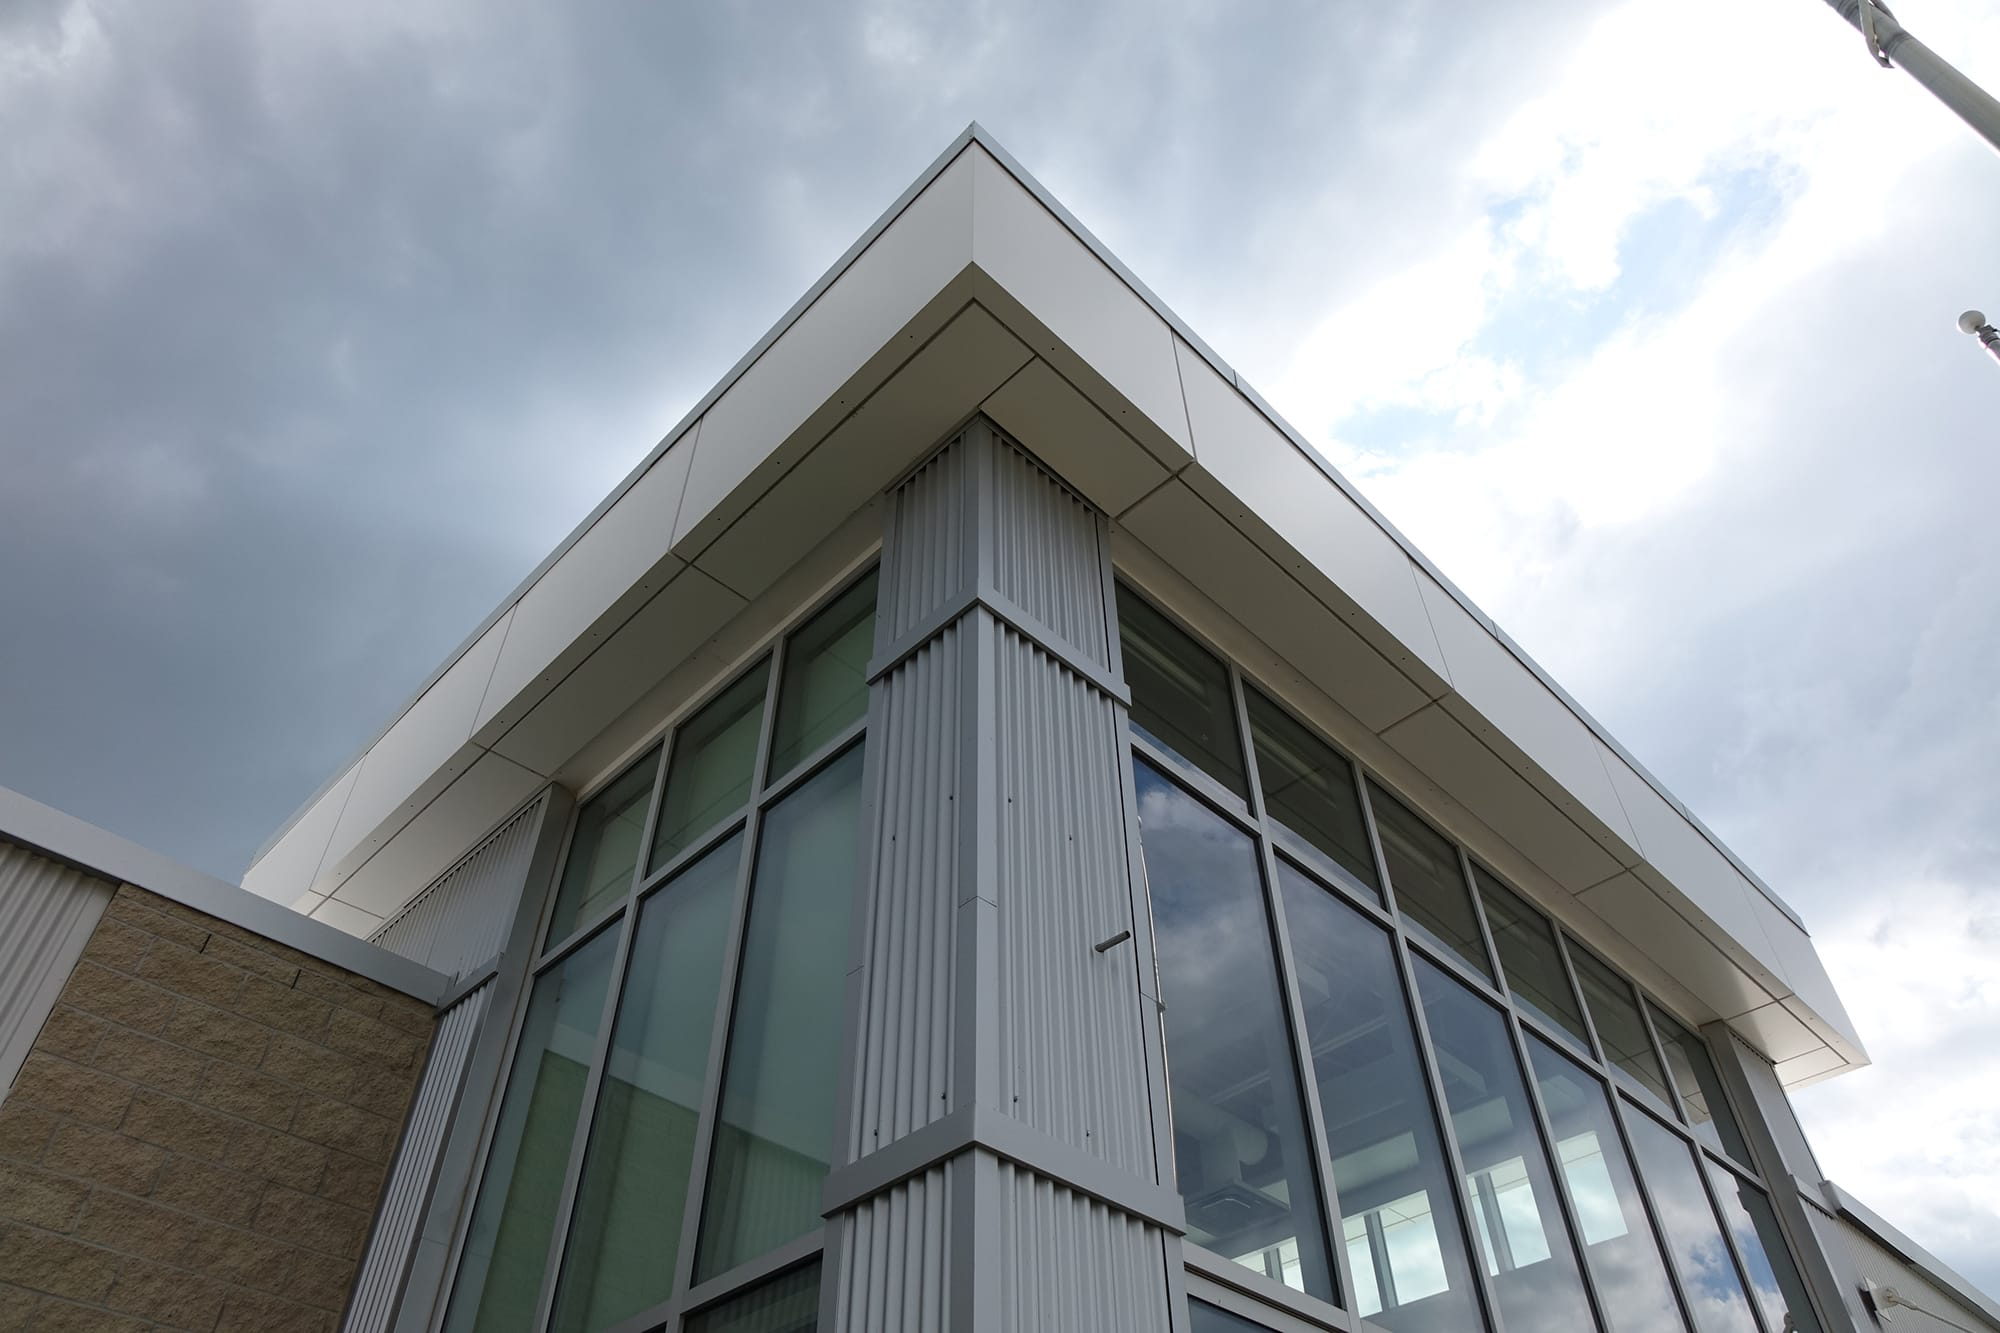 École Francophone Airdrie School exterior corner looking up